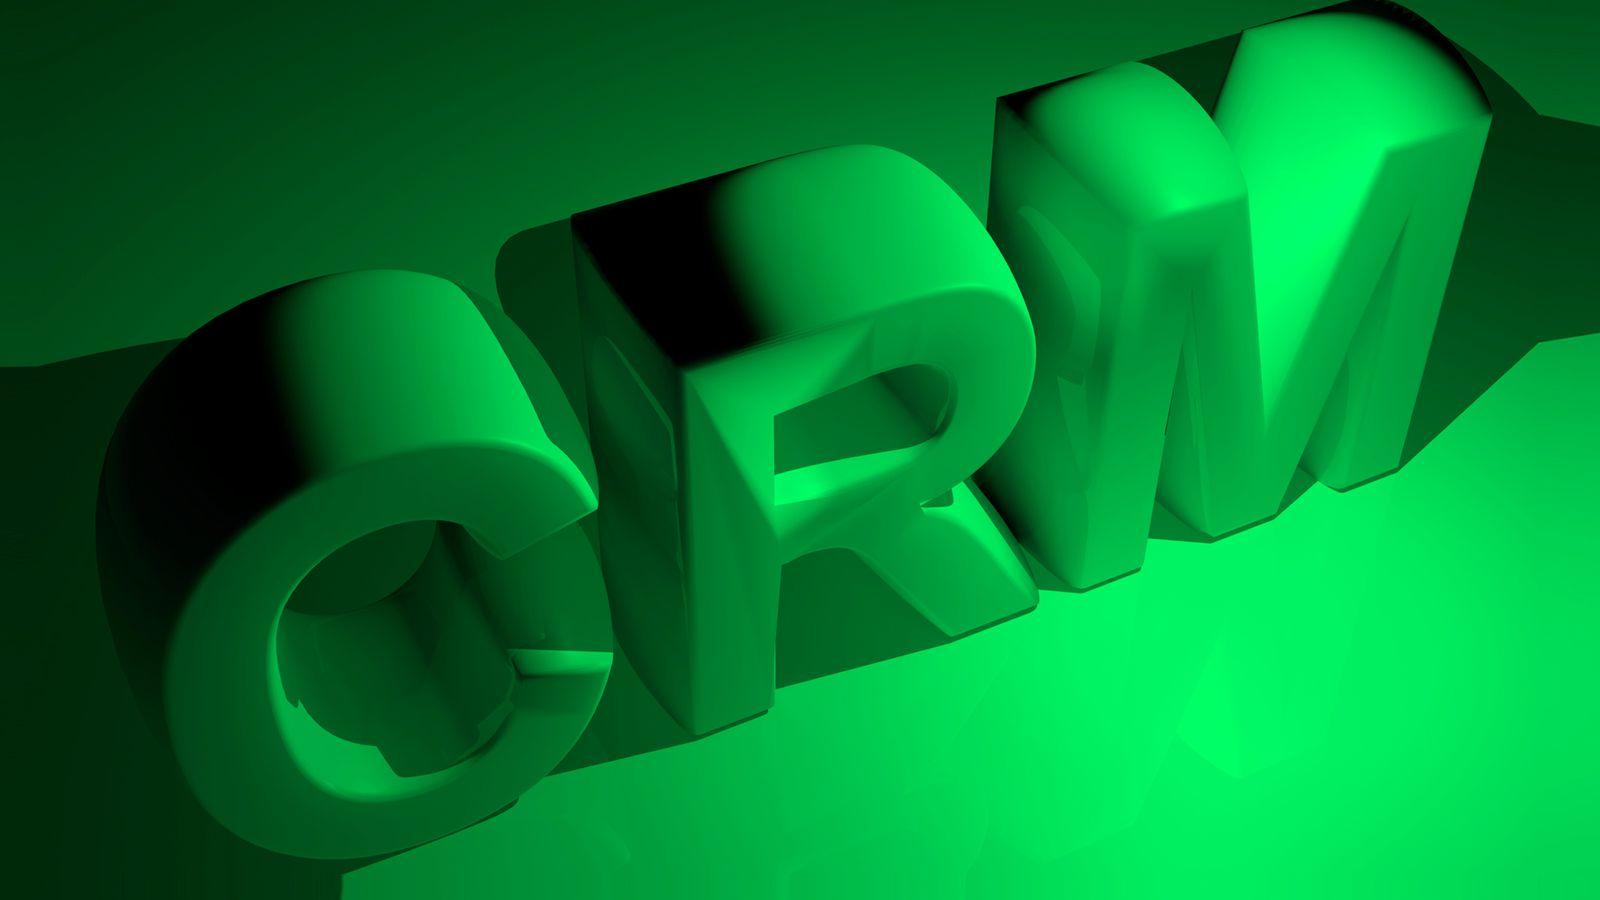 crm-green-2